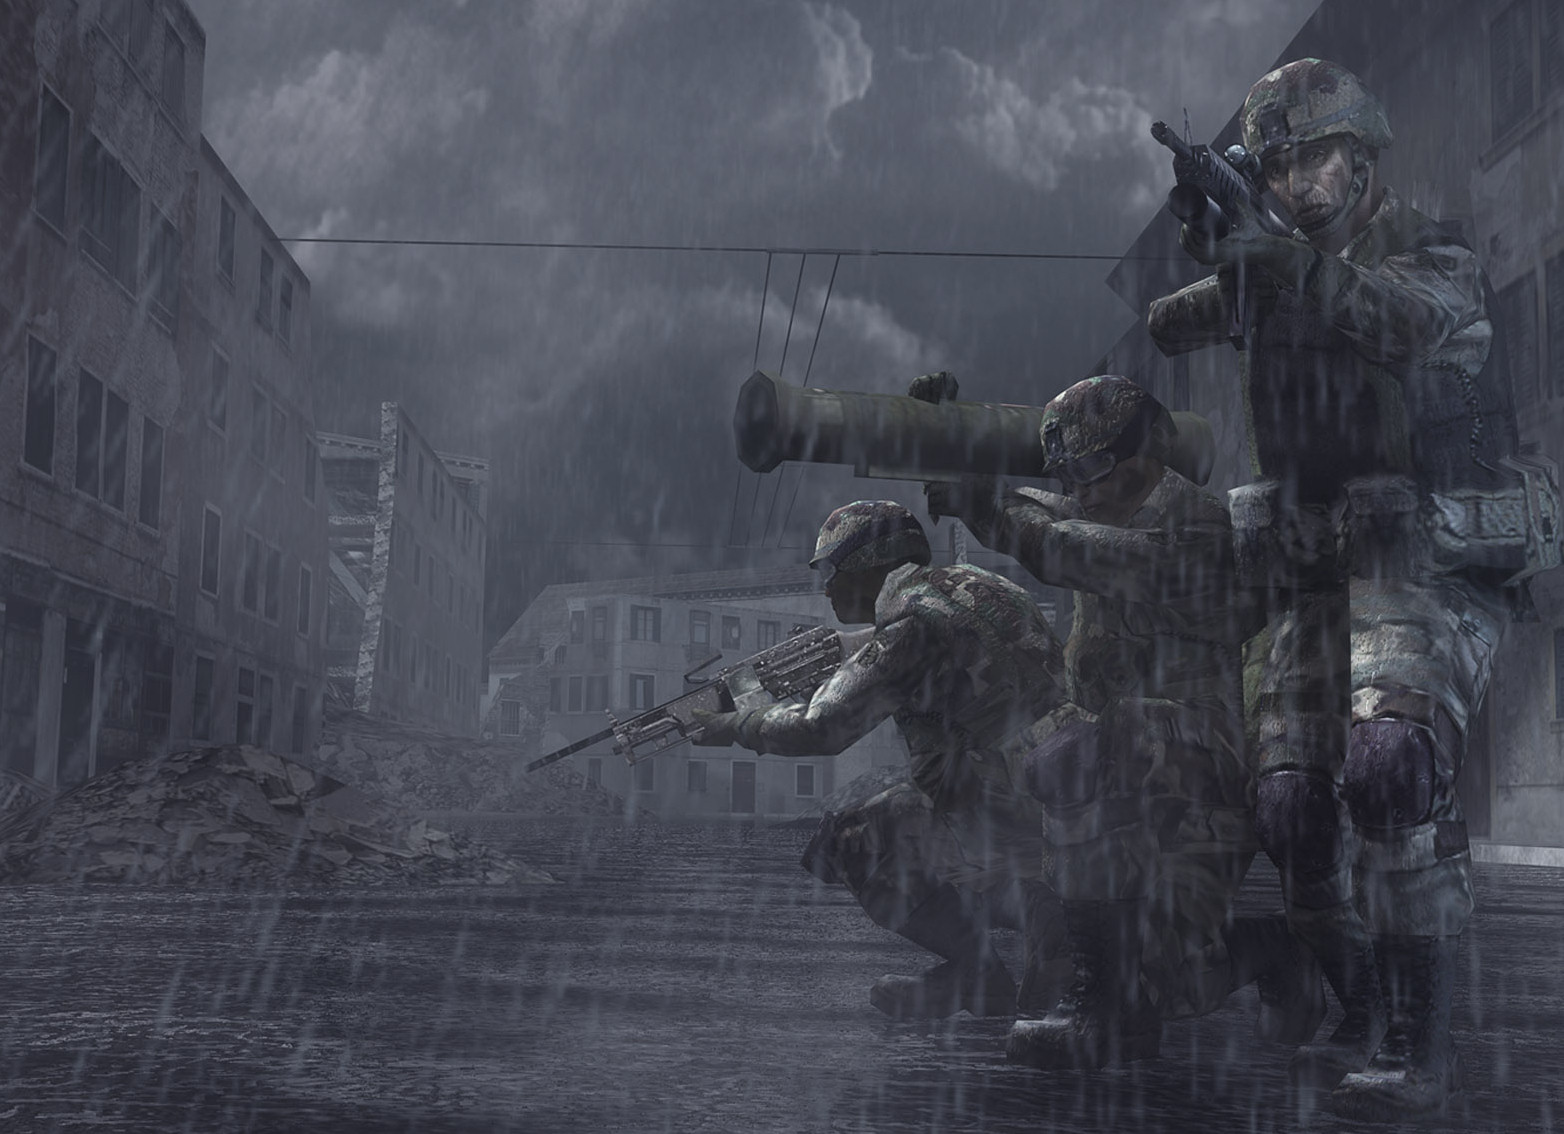 heroes unleashed video